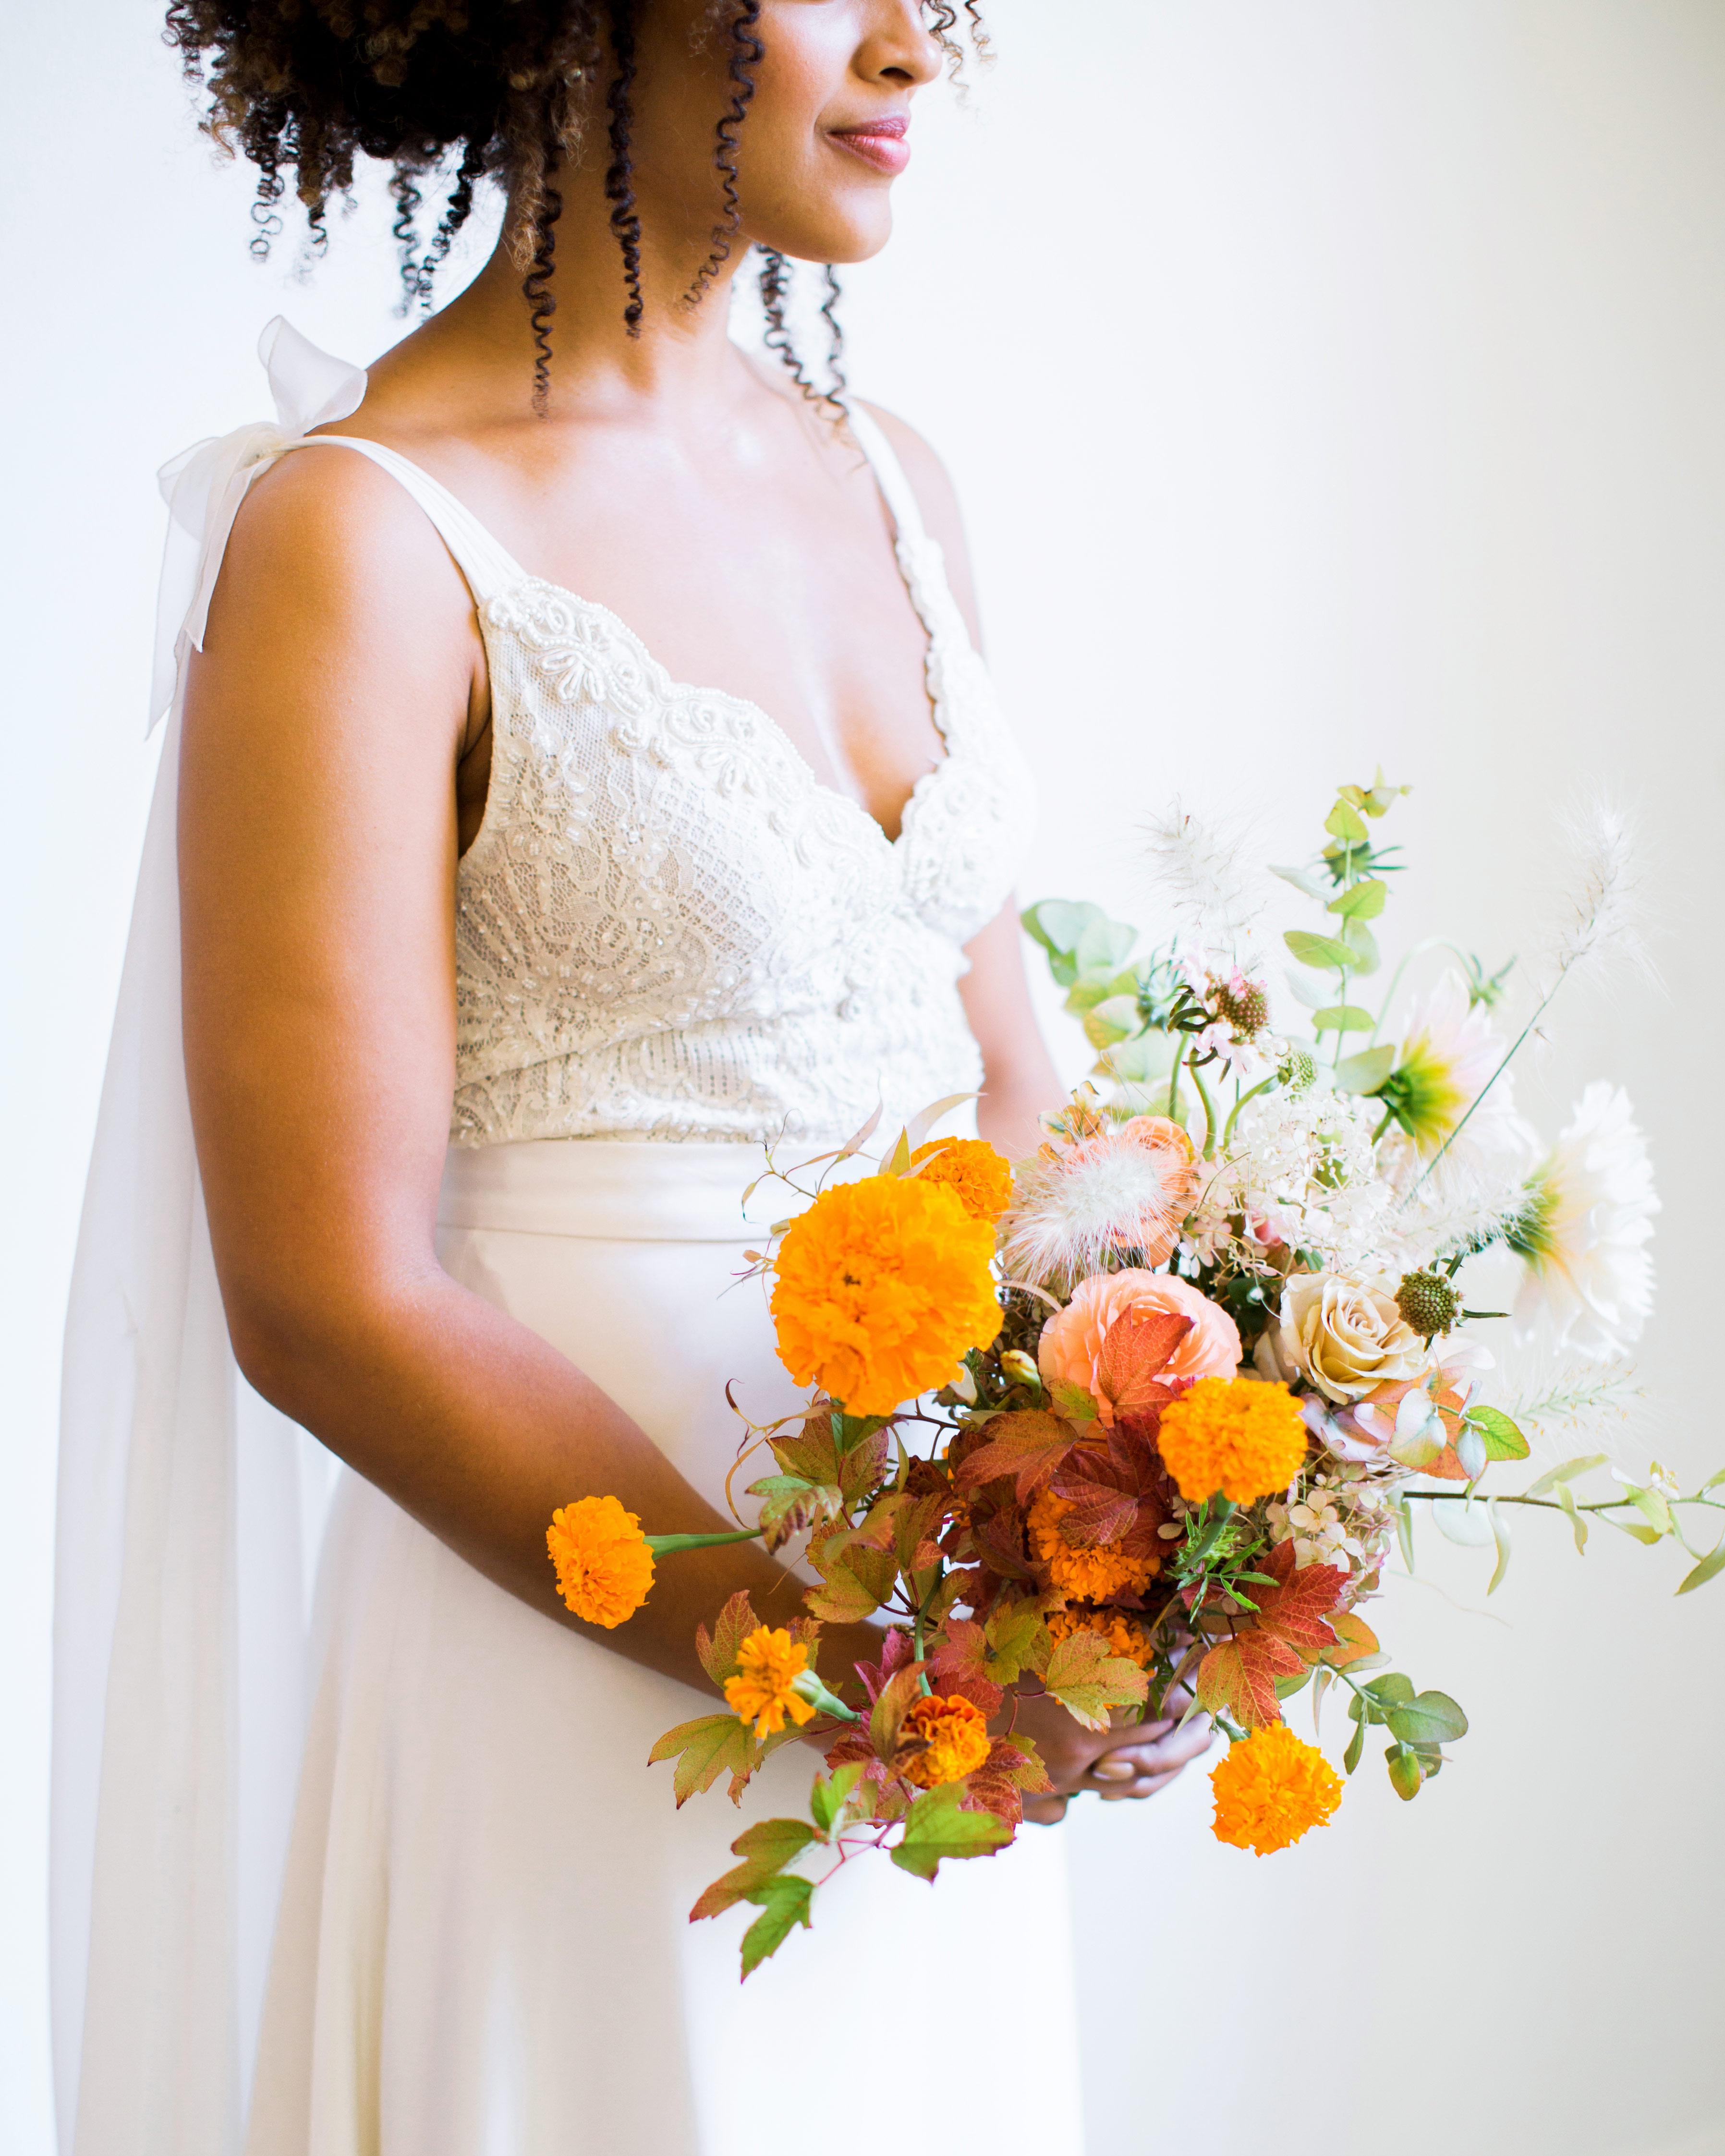 natalie louis wedding bouquet